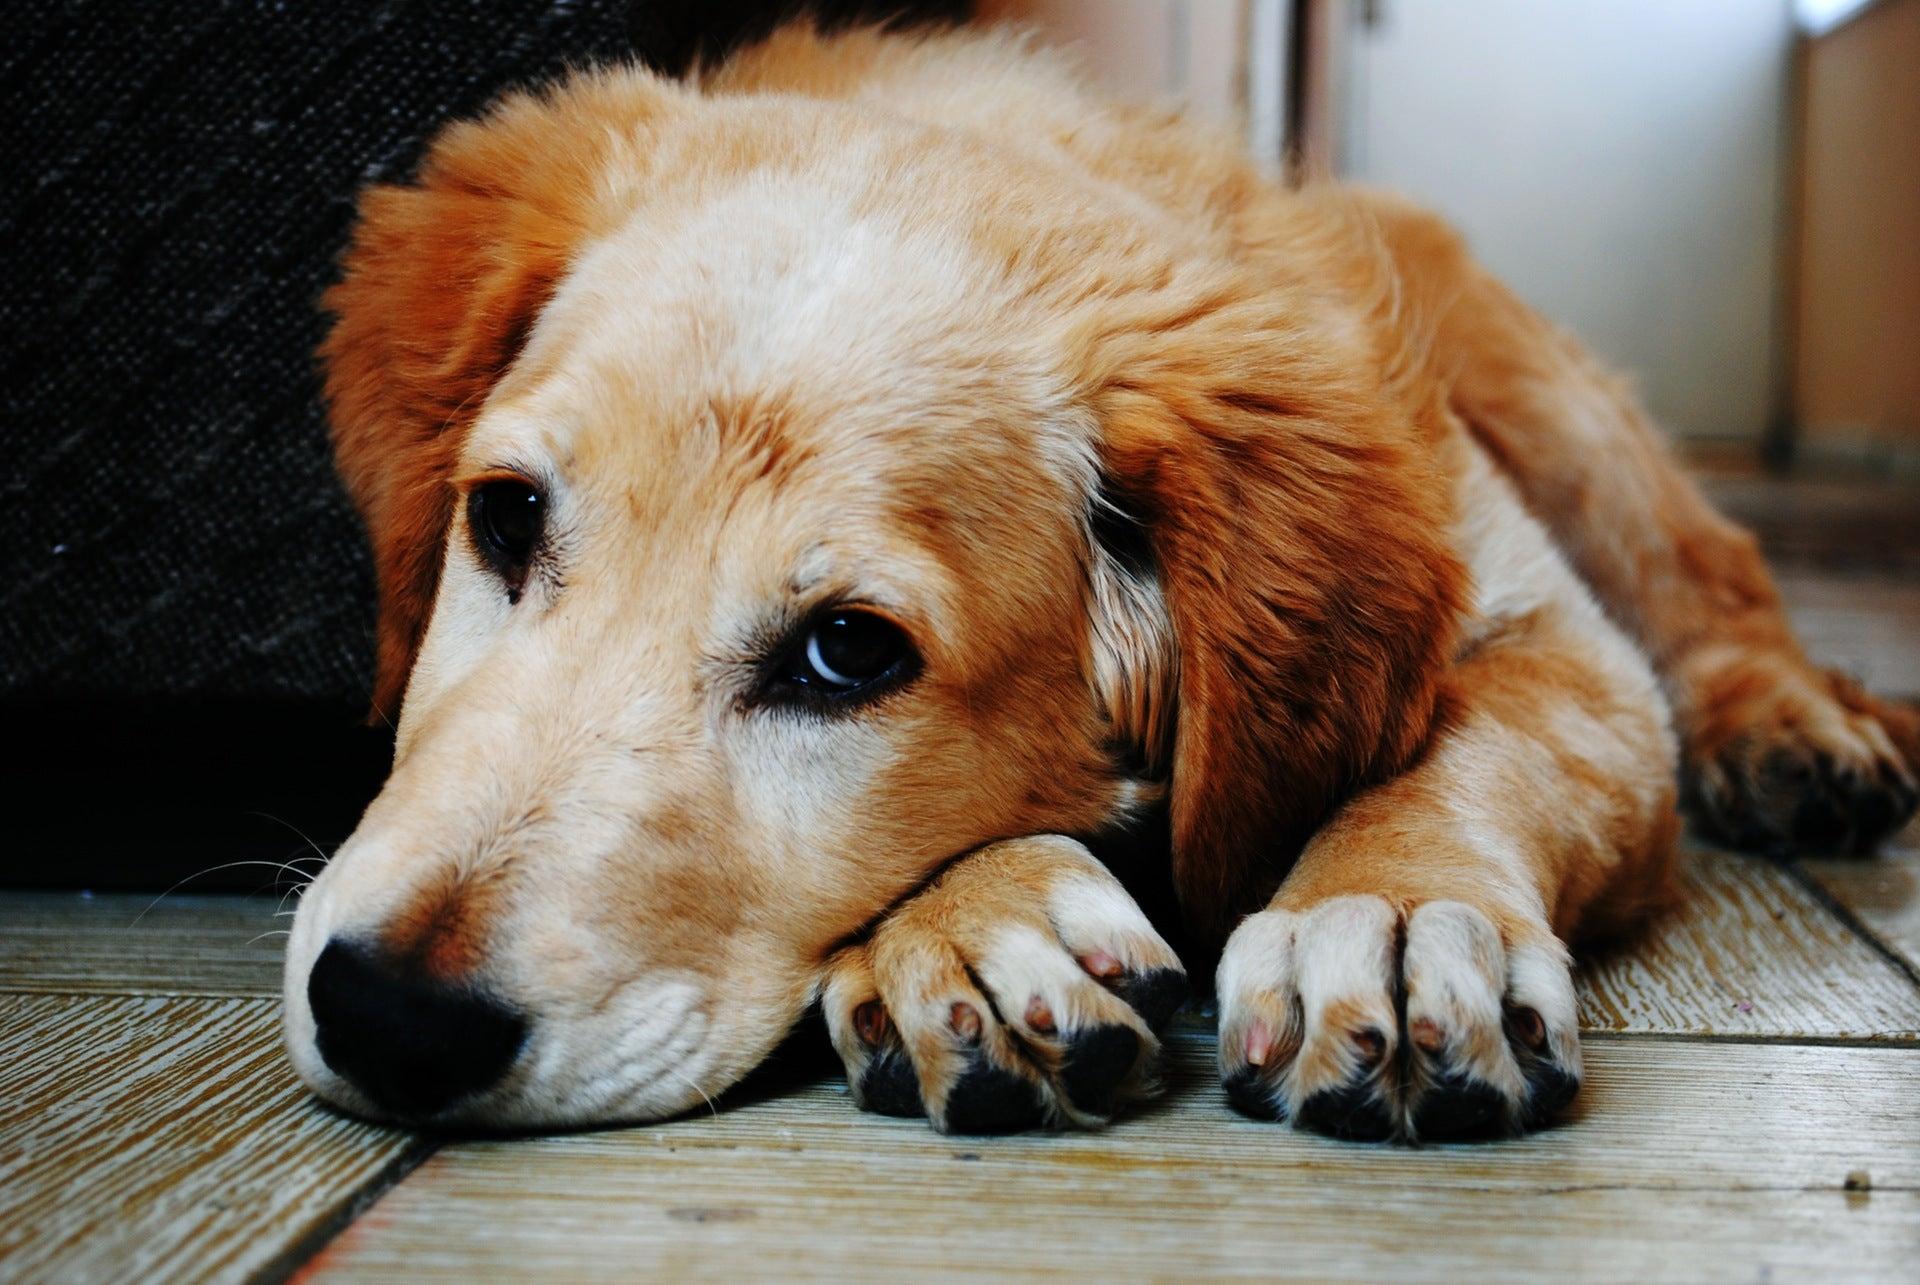 A very good dog